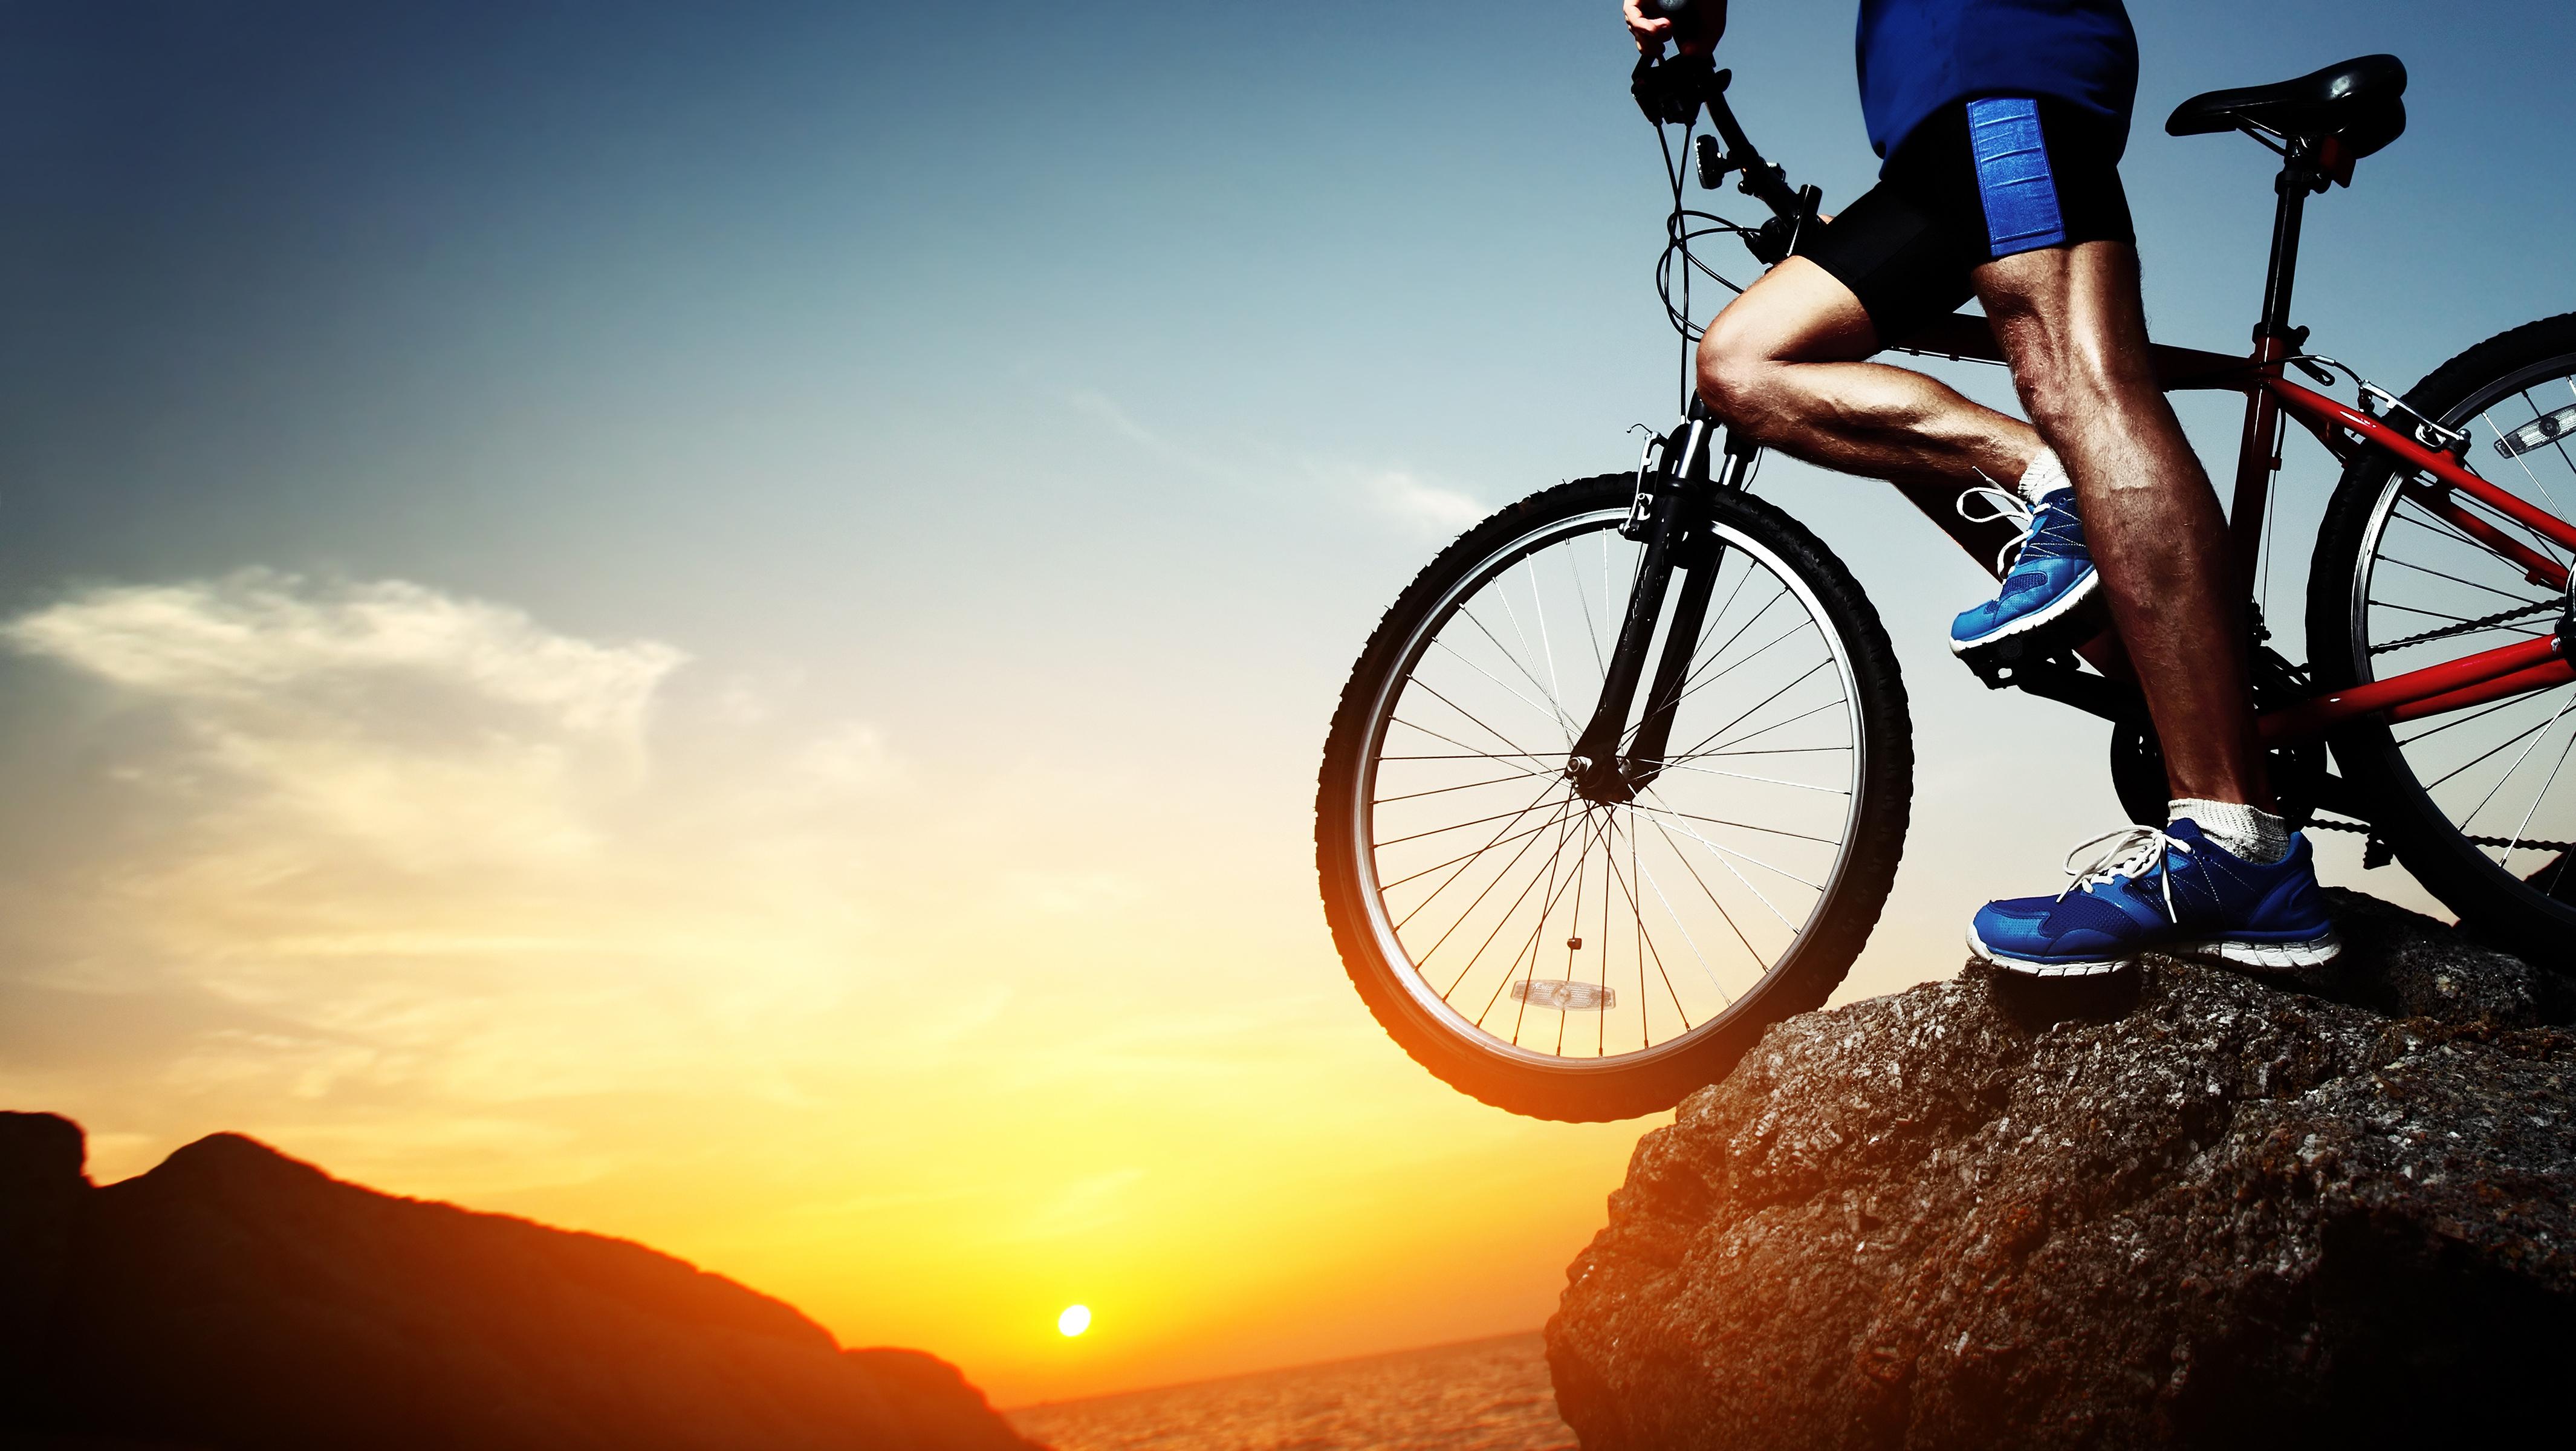 спорт велосипед споротсмен мужчина  № 1633583  скачать